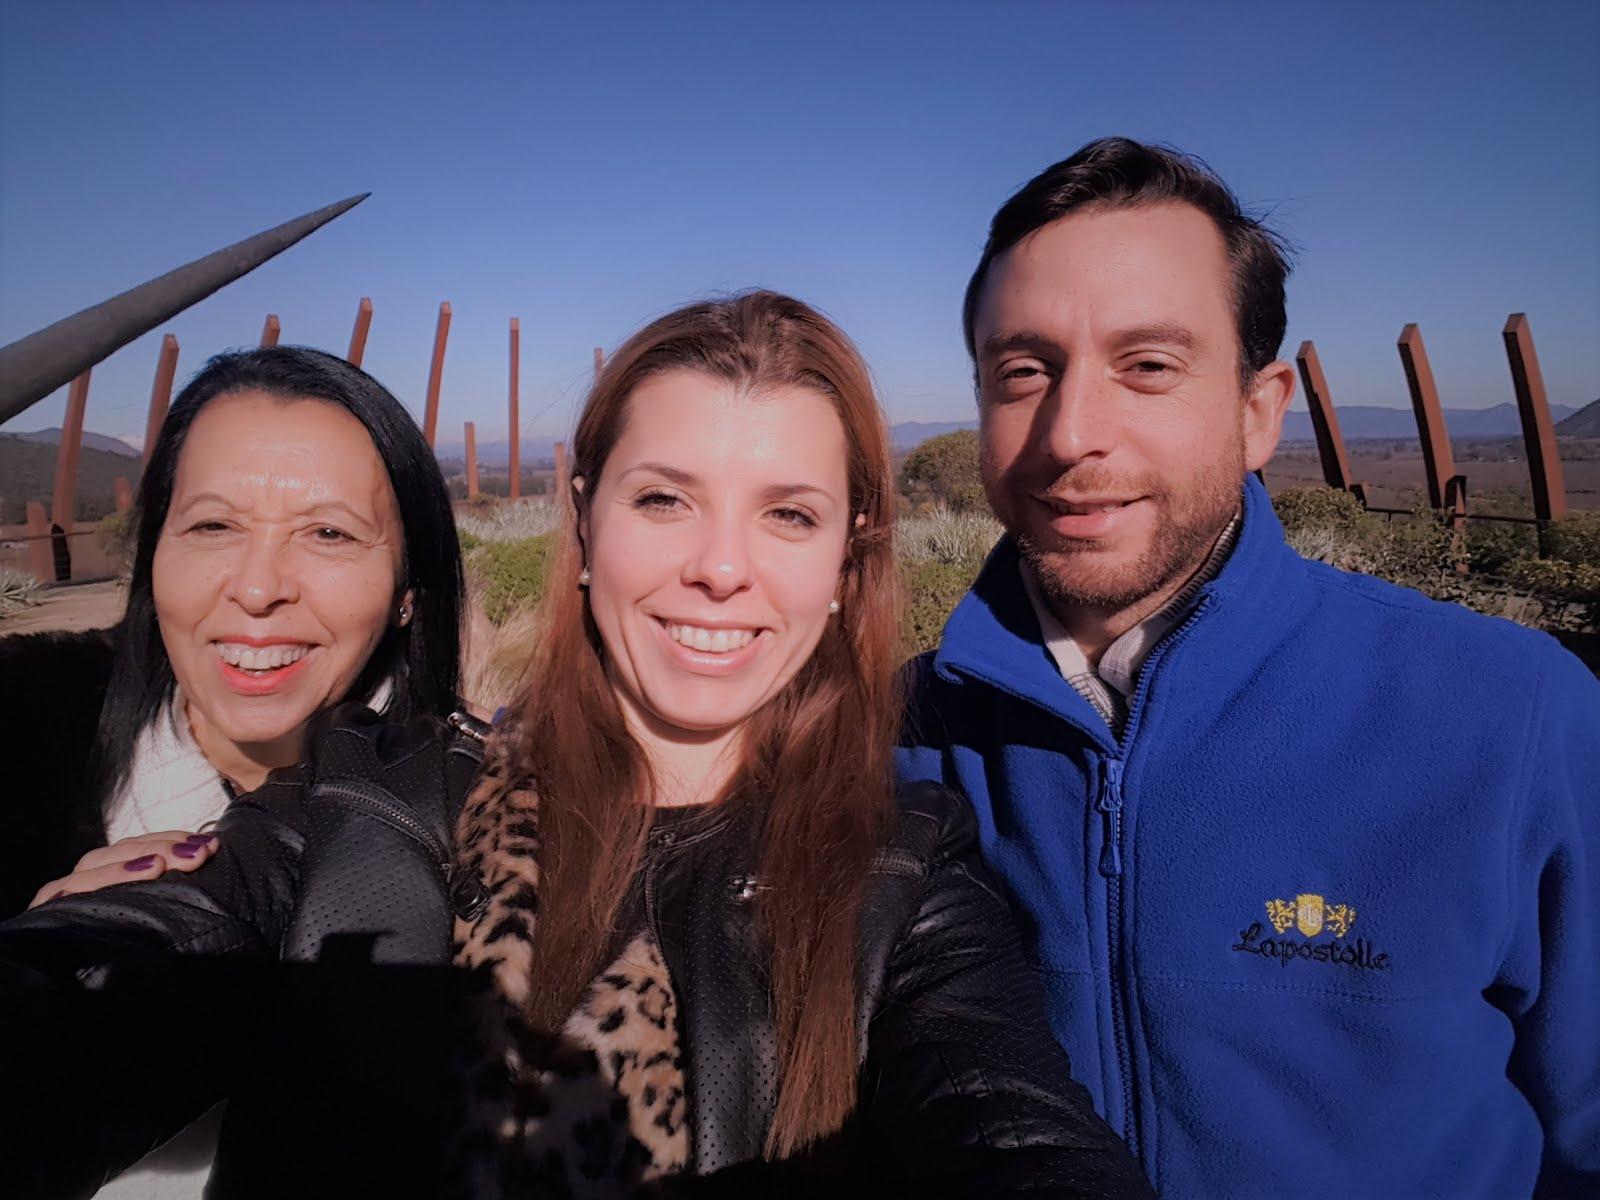 Momento com  o Enólogo Diego Urra Grosselin na Vinícola Lapostolle no Chile